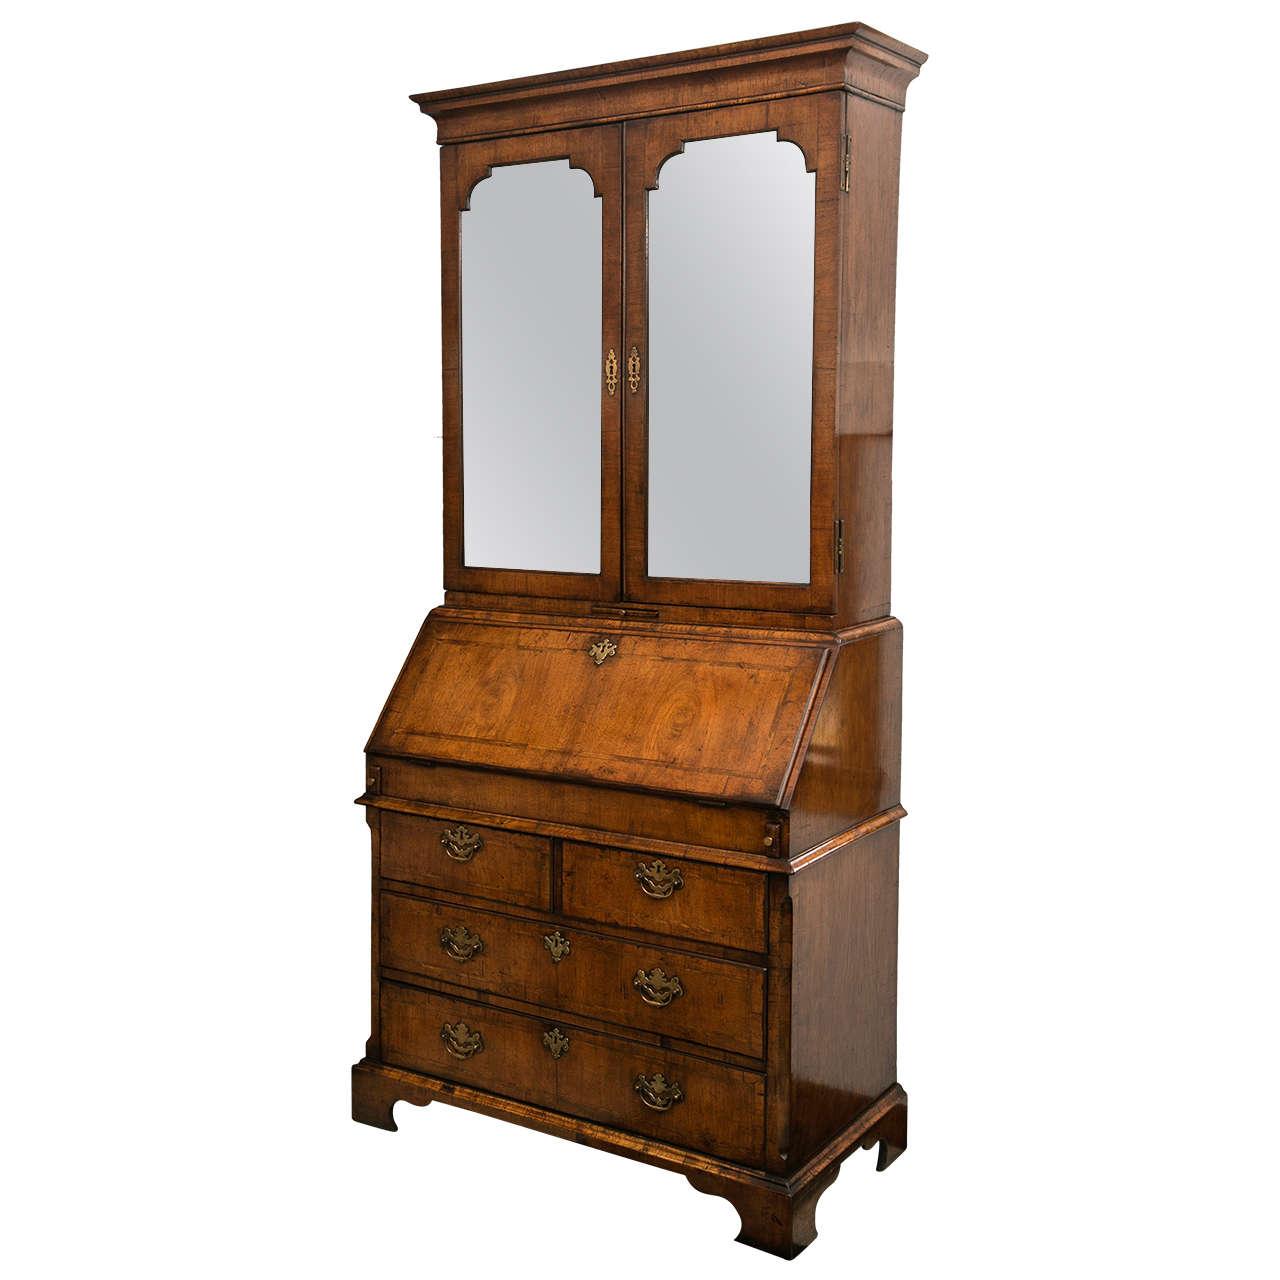 Walnut Slant Front Bureau Bookcase / Secretary For Sale